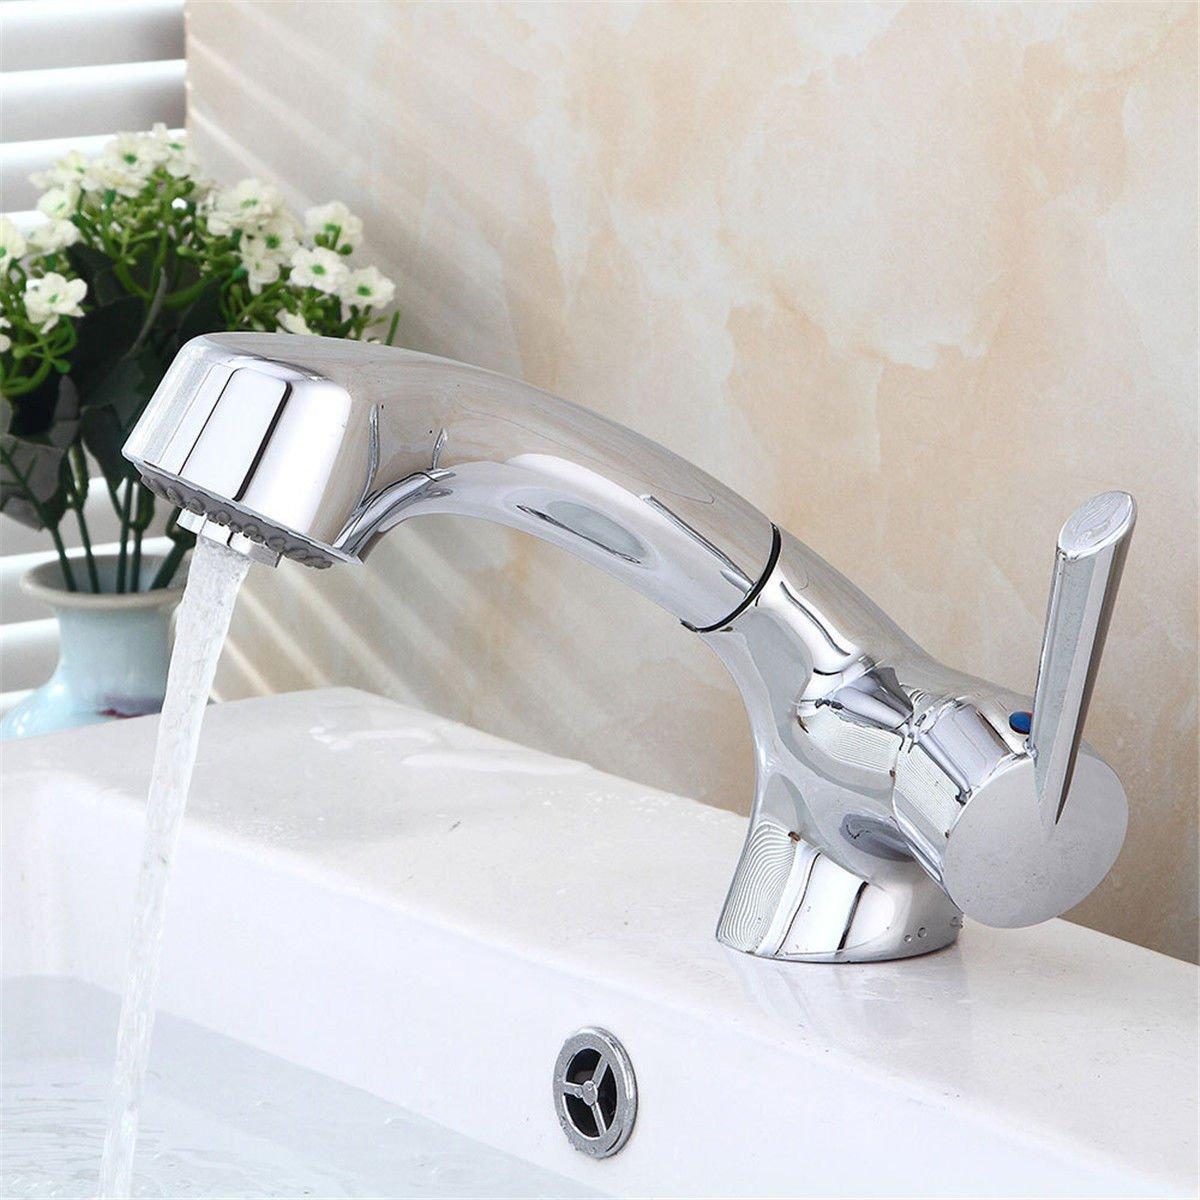 LHbox Basin Mixer Tap Bathroom Sink Faucet The modern all-copper pull basin faucet bathroom sink basin mixer bathroom-cold water woman wash water under the bathroom sink basin Faucet